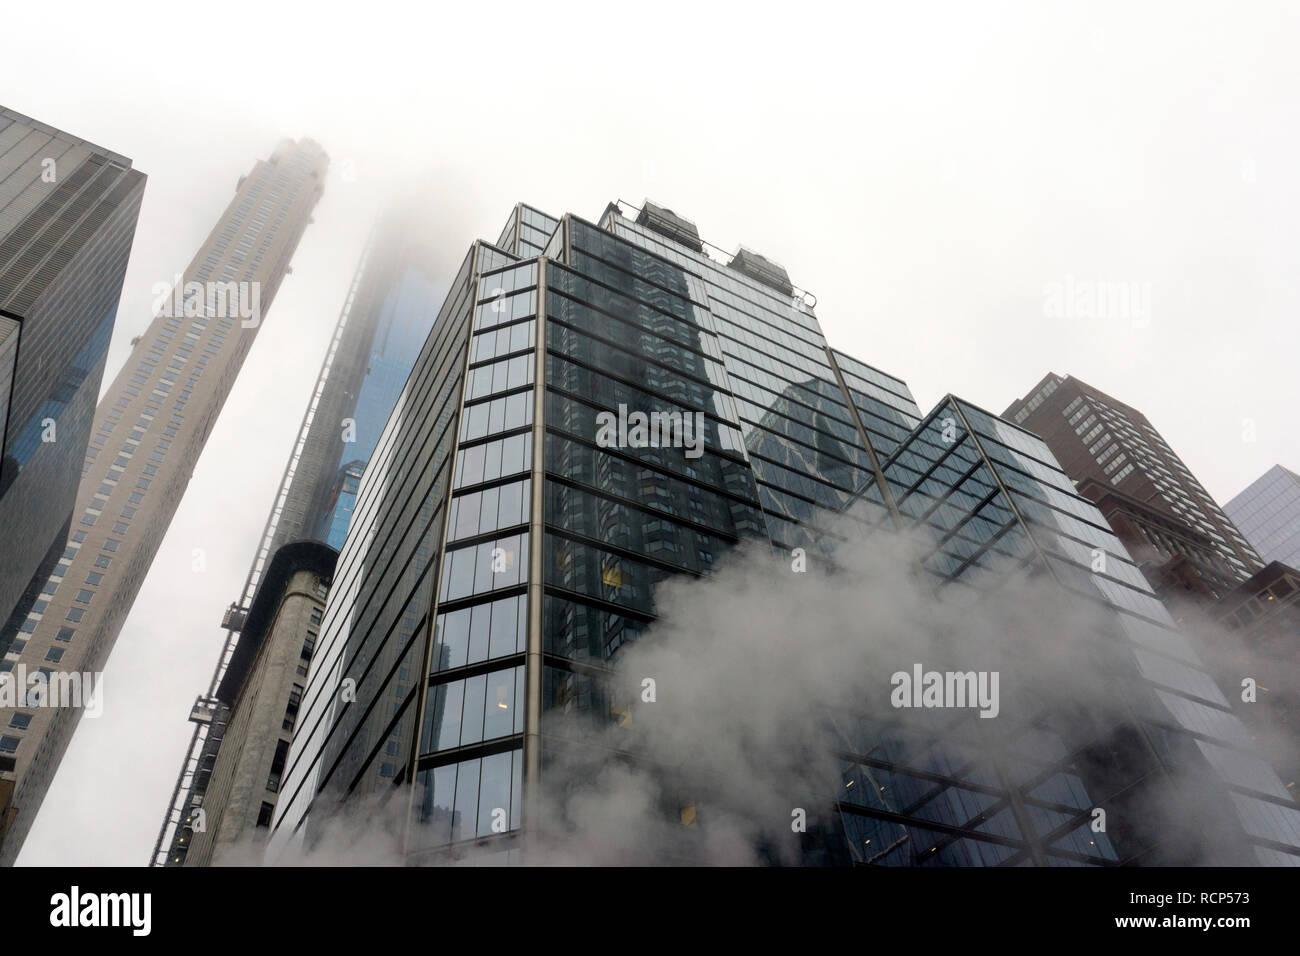 Skyscrapers, modern buildings in New York city - Stock Image